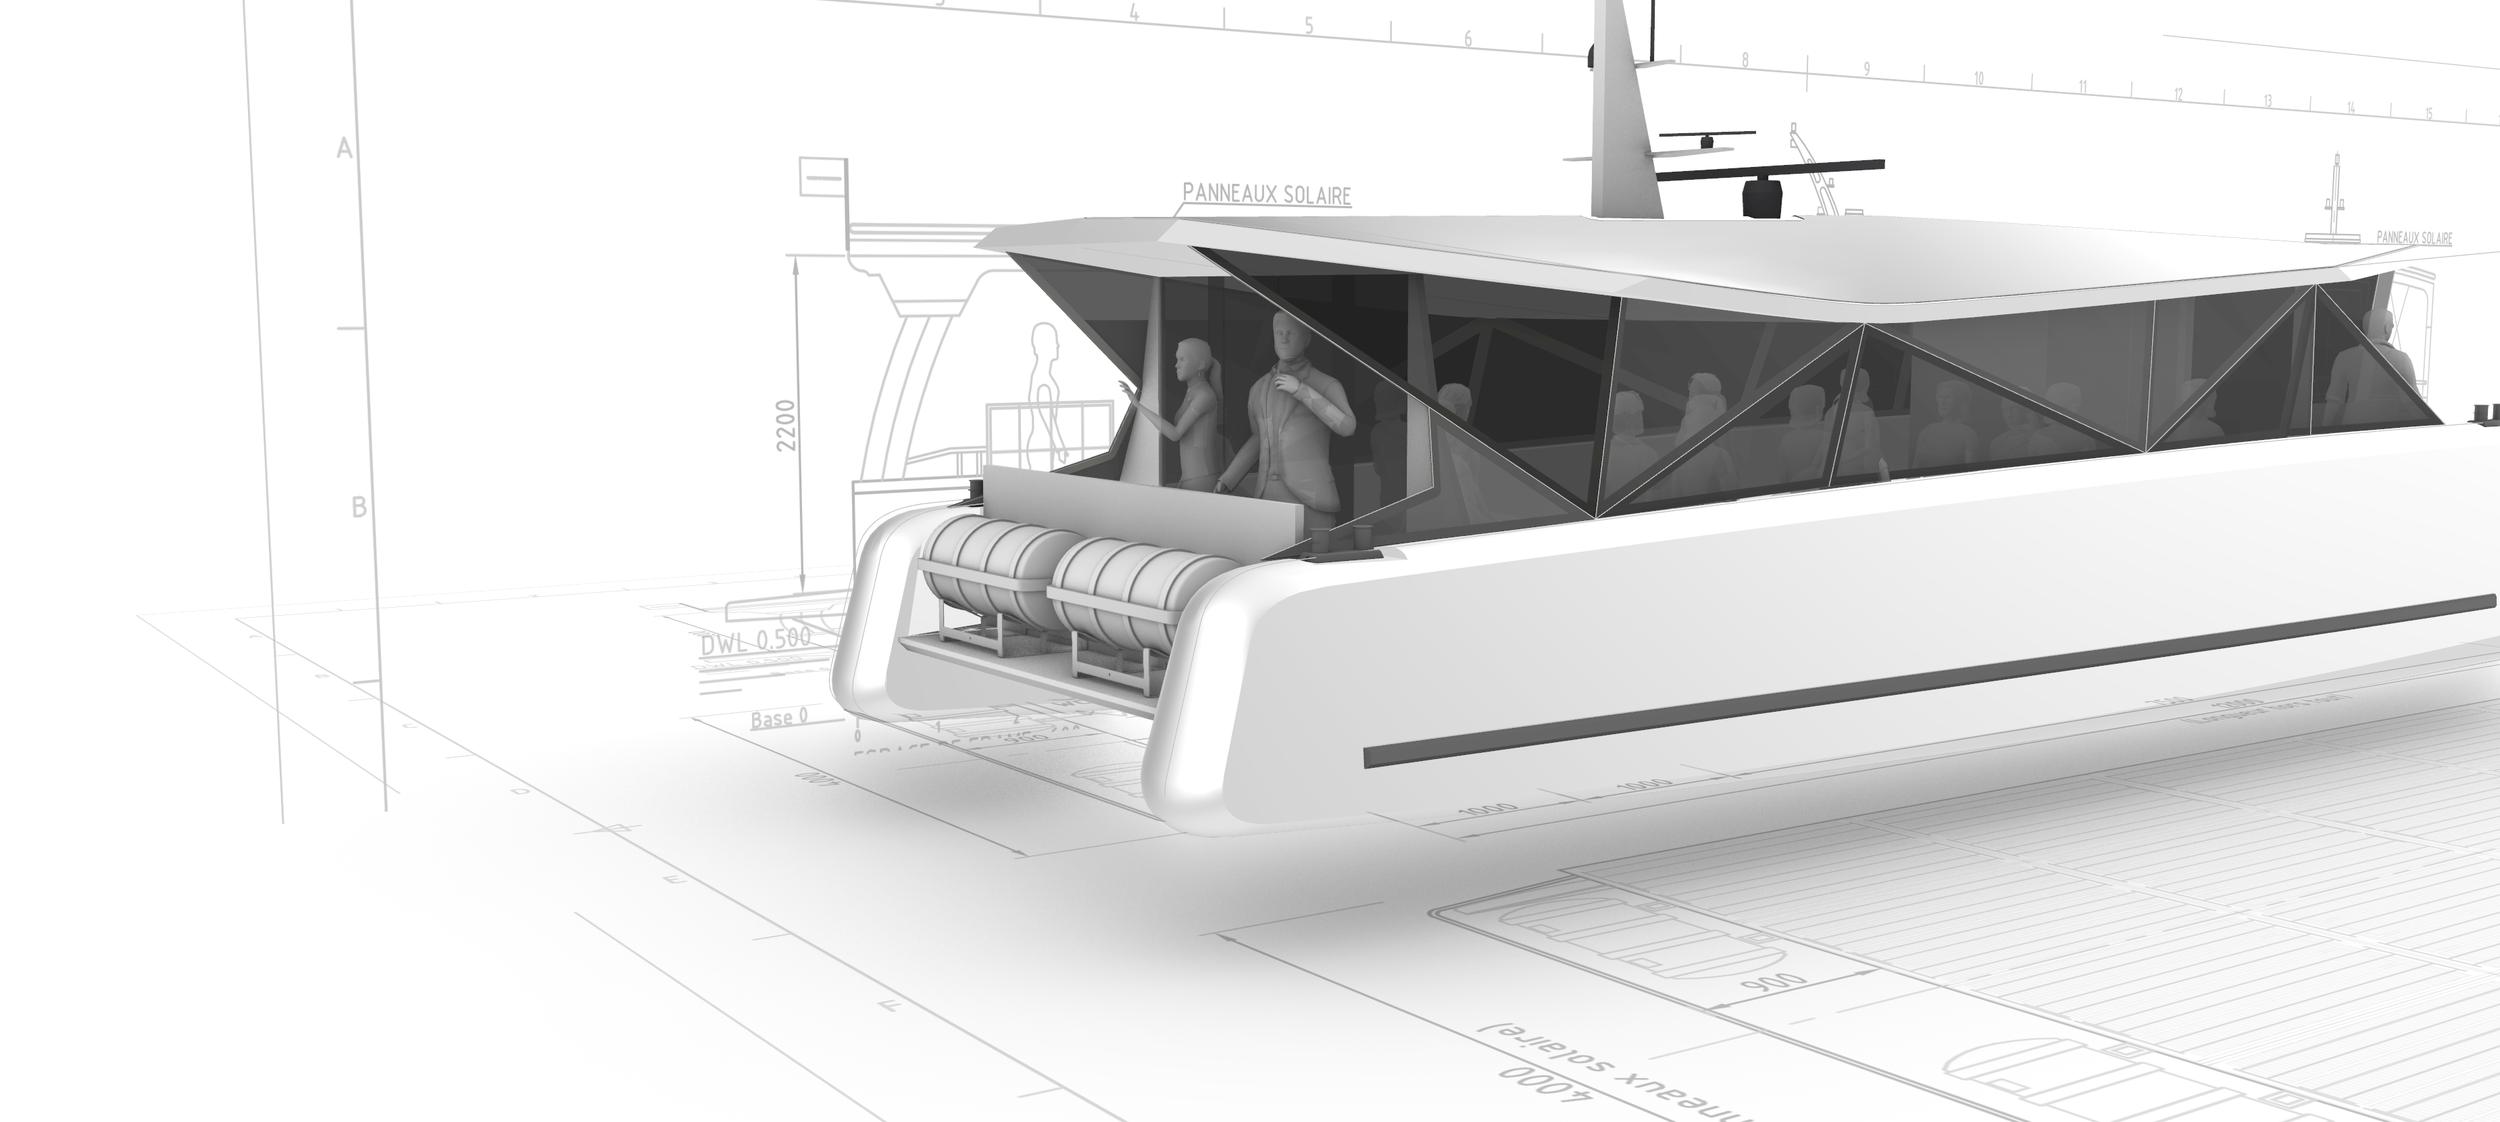 Solar_fuelled_boat_Pivot_Concept6.png